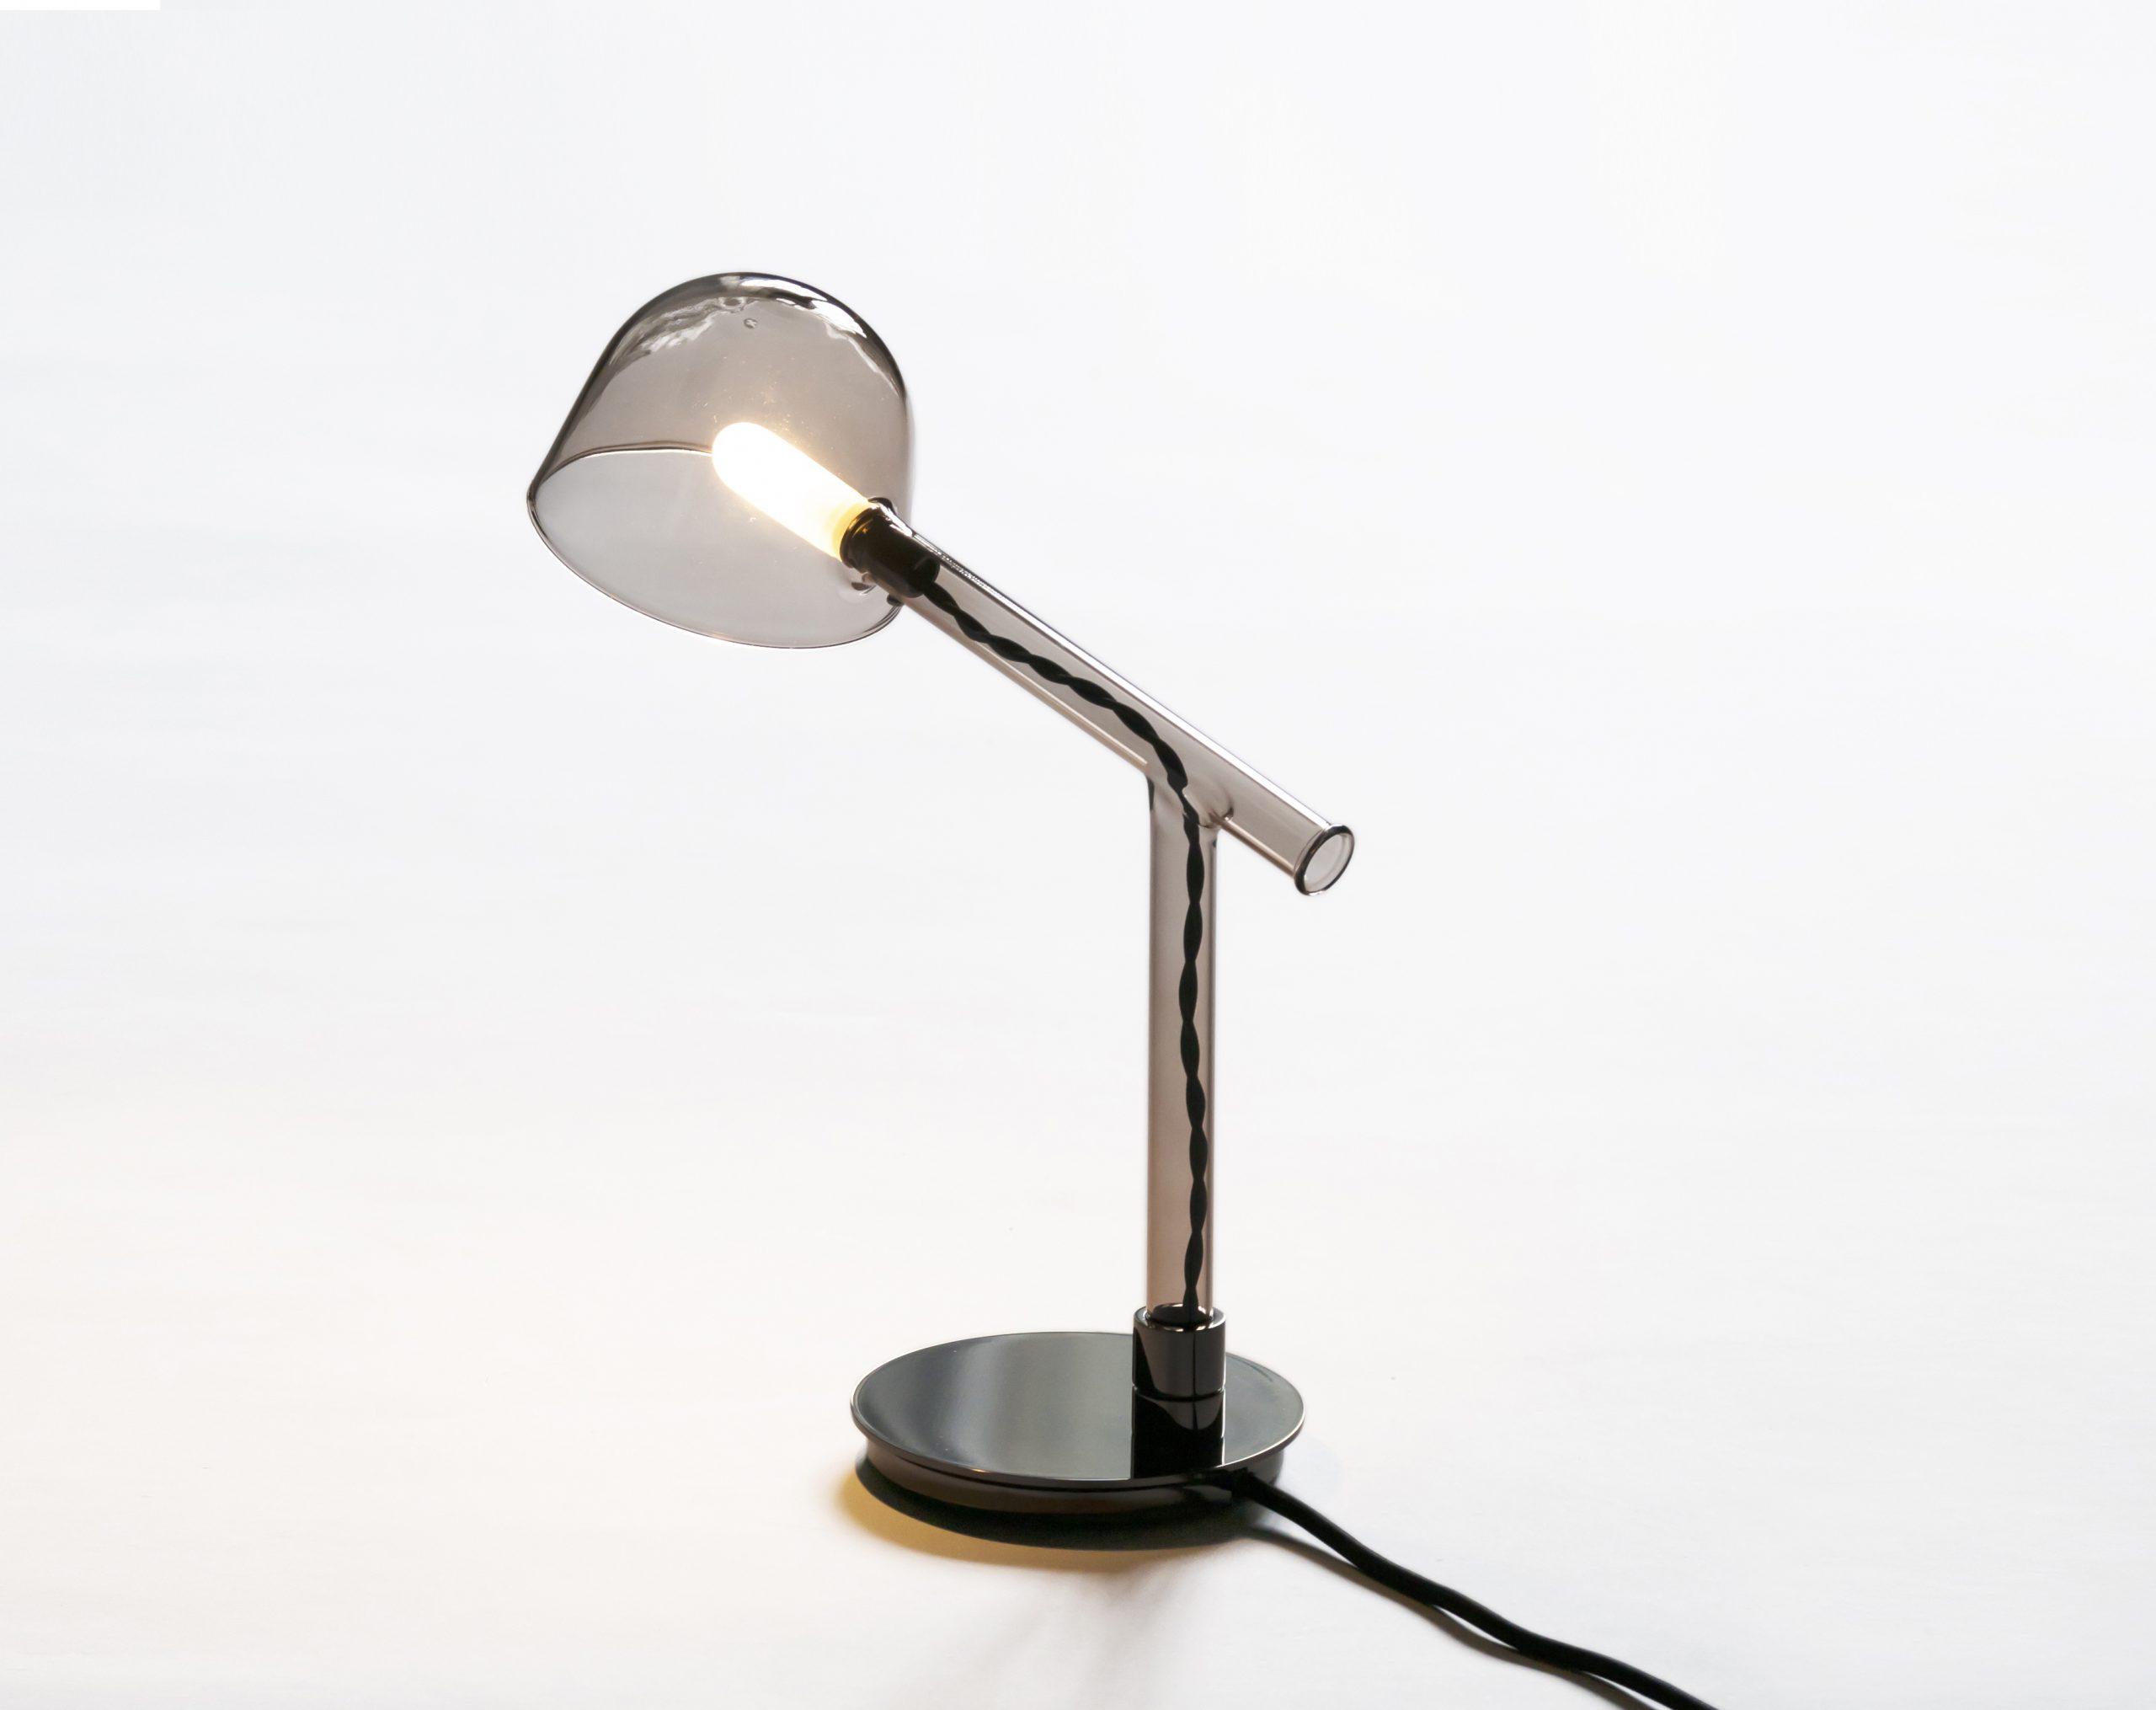 Labo borosilicate glass lamp by Debiasi Sandri for Penta